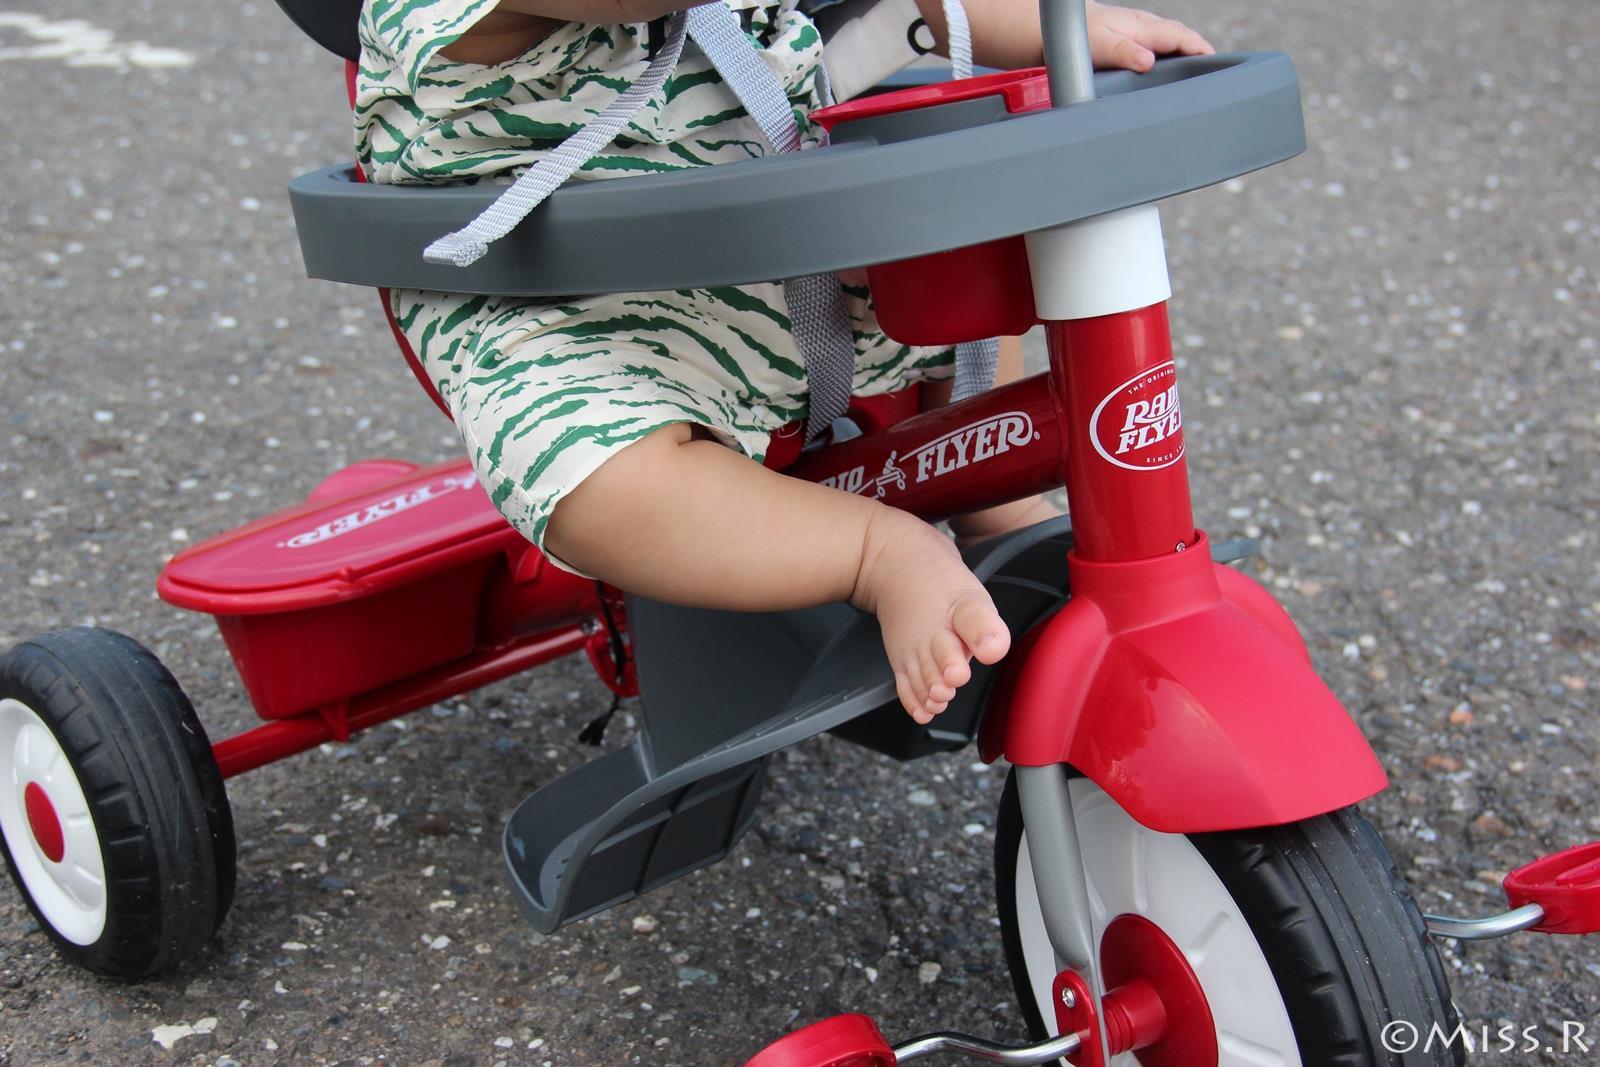 RadioFlyer,紅犀牛四合一三輪推車,RadioFlyer推車,mamas&papas,mamasandpapas,婦幼展,嬰兒推車,嬰兒三輪車,幼兒三輪車,兒童三輪車,三輪車推薦